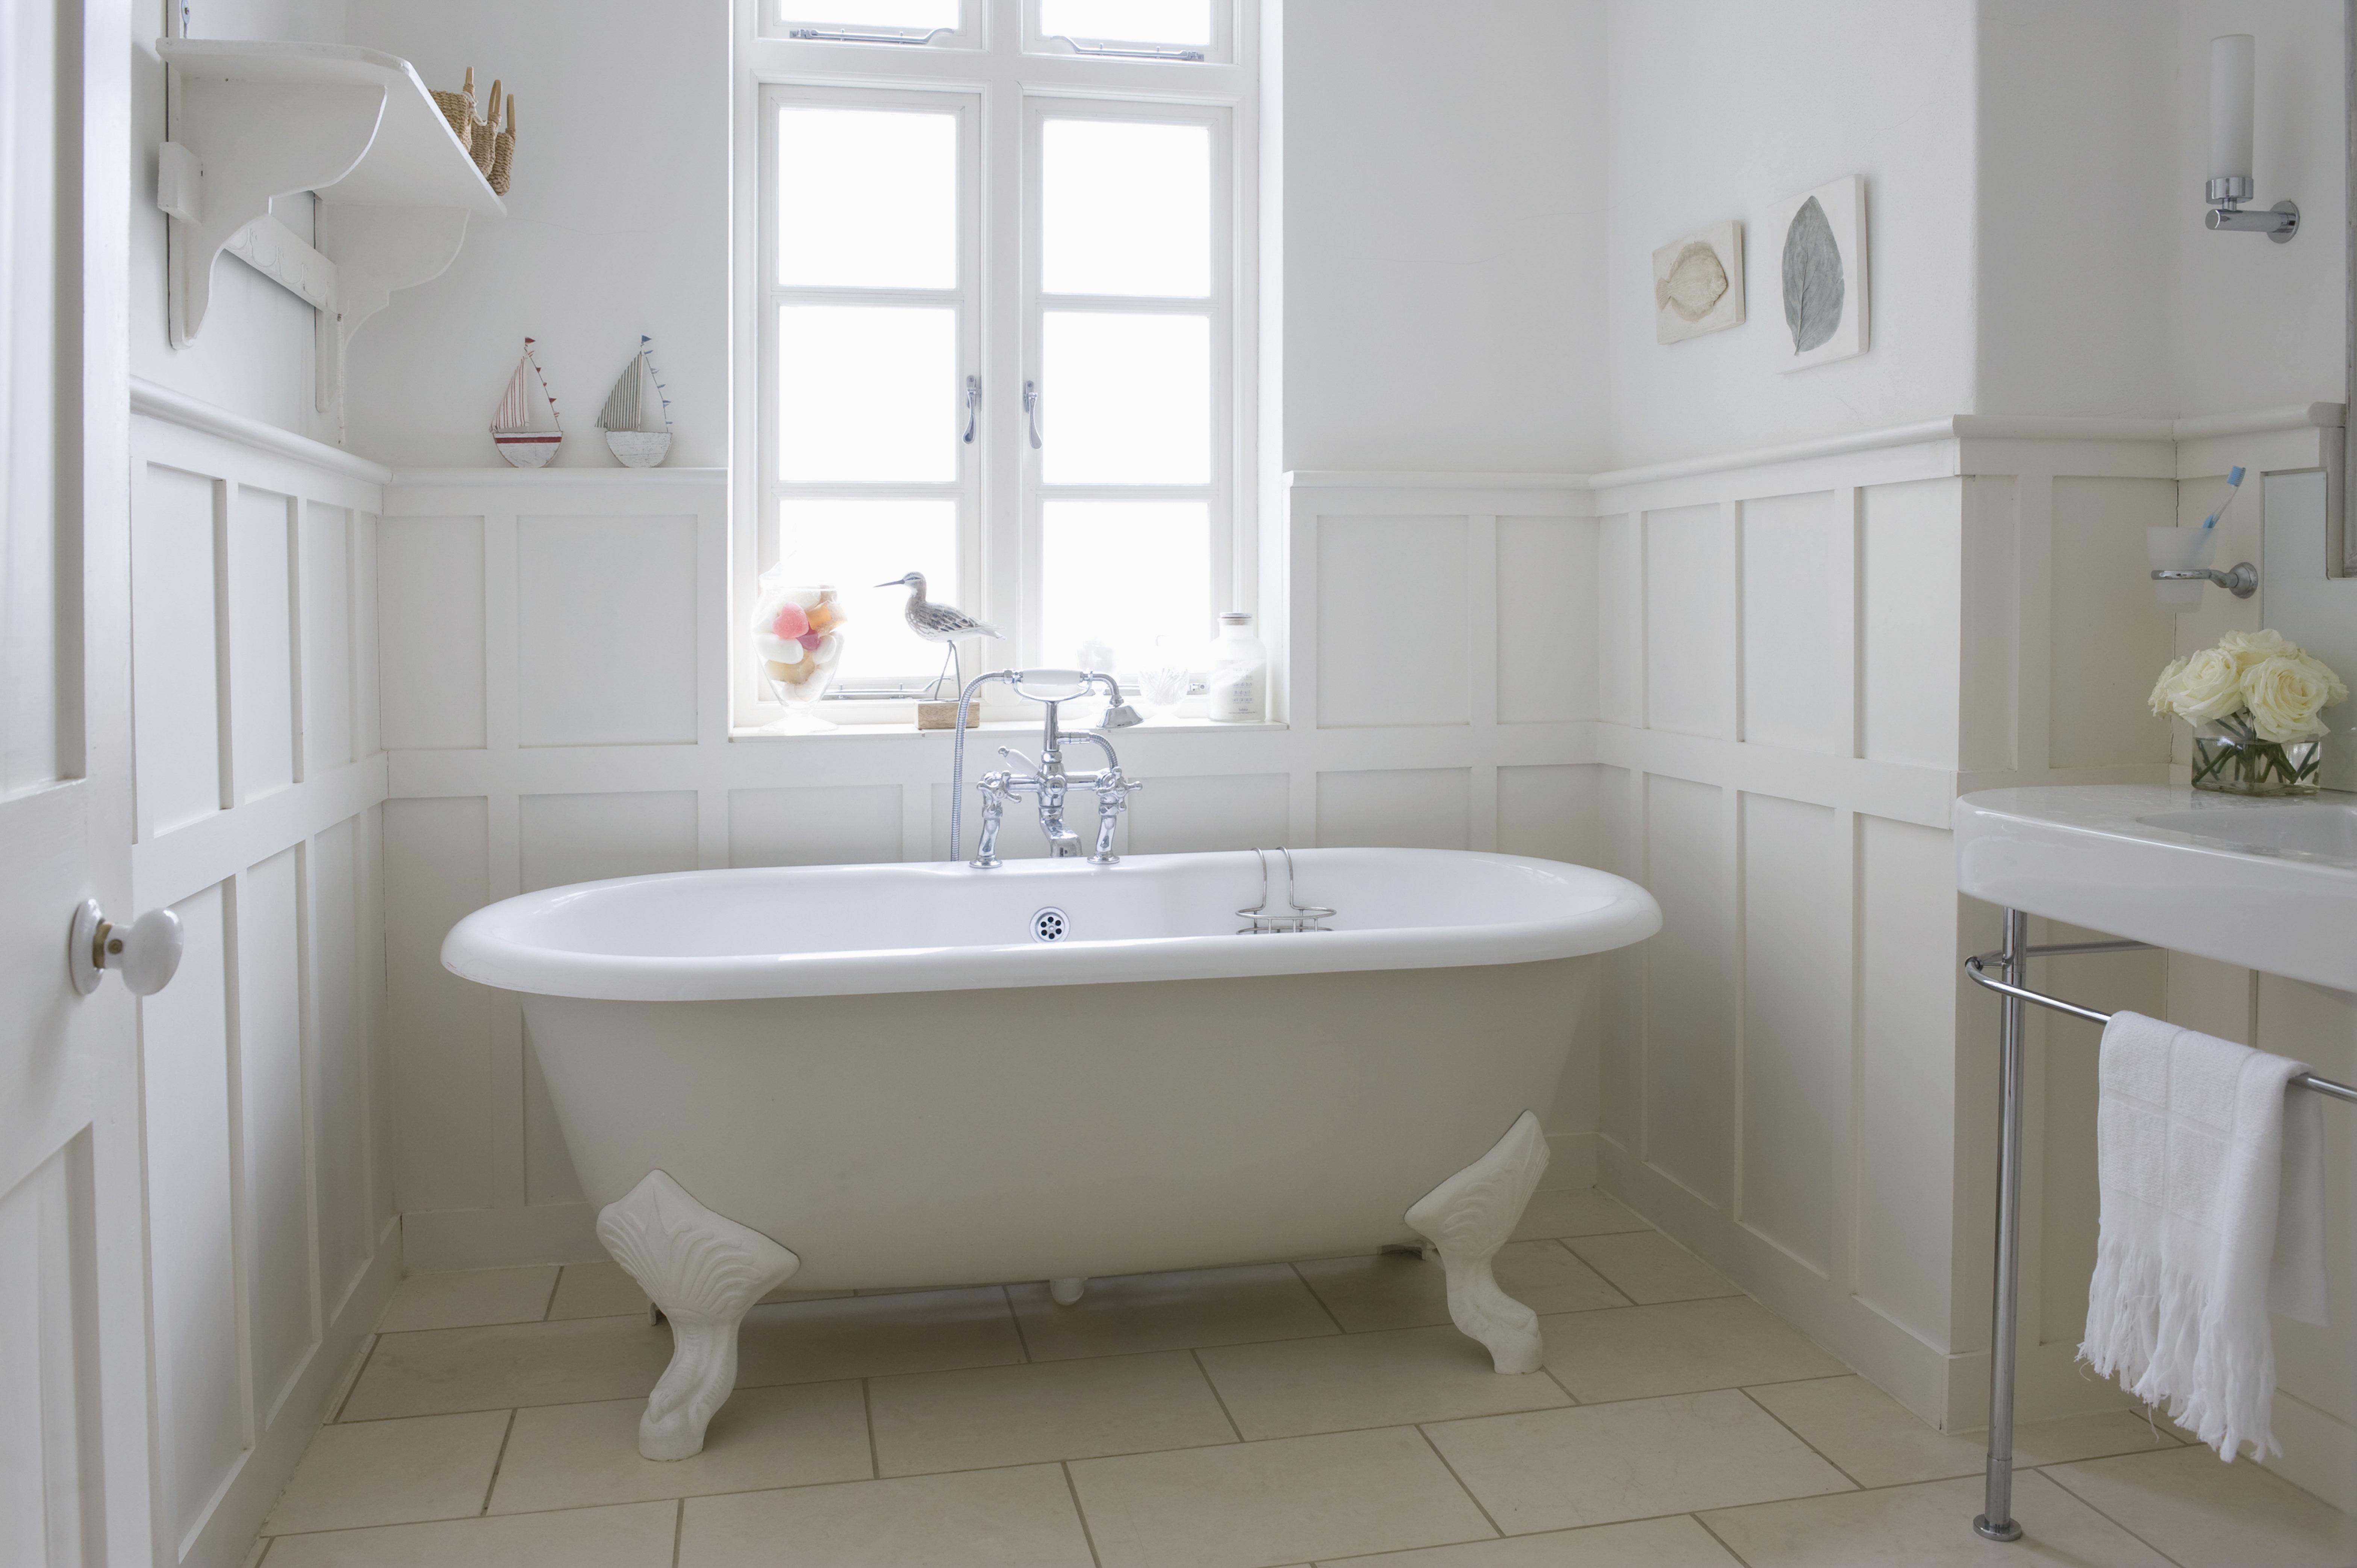 Freestanding bathtub in bathroom